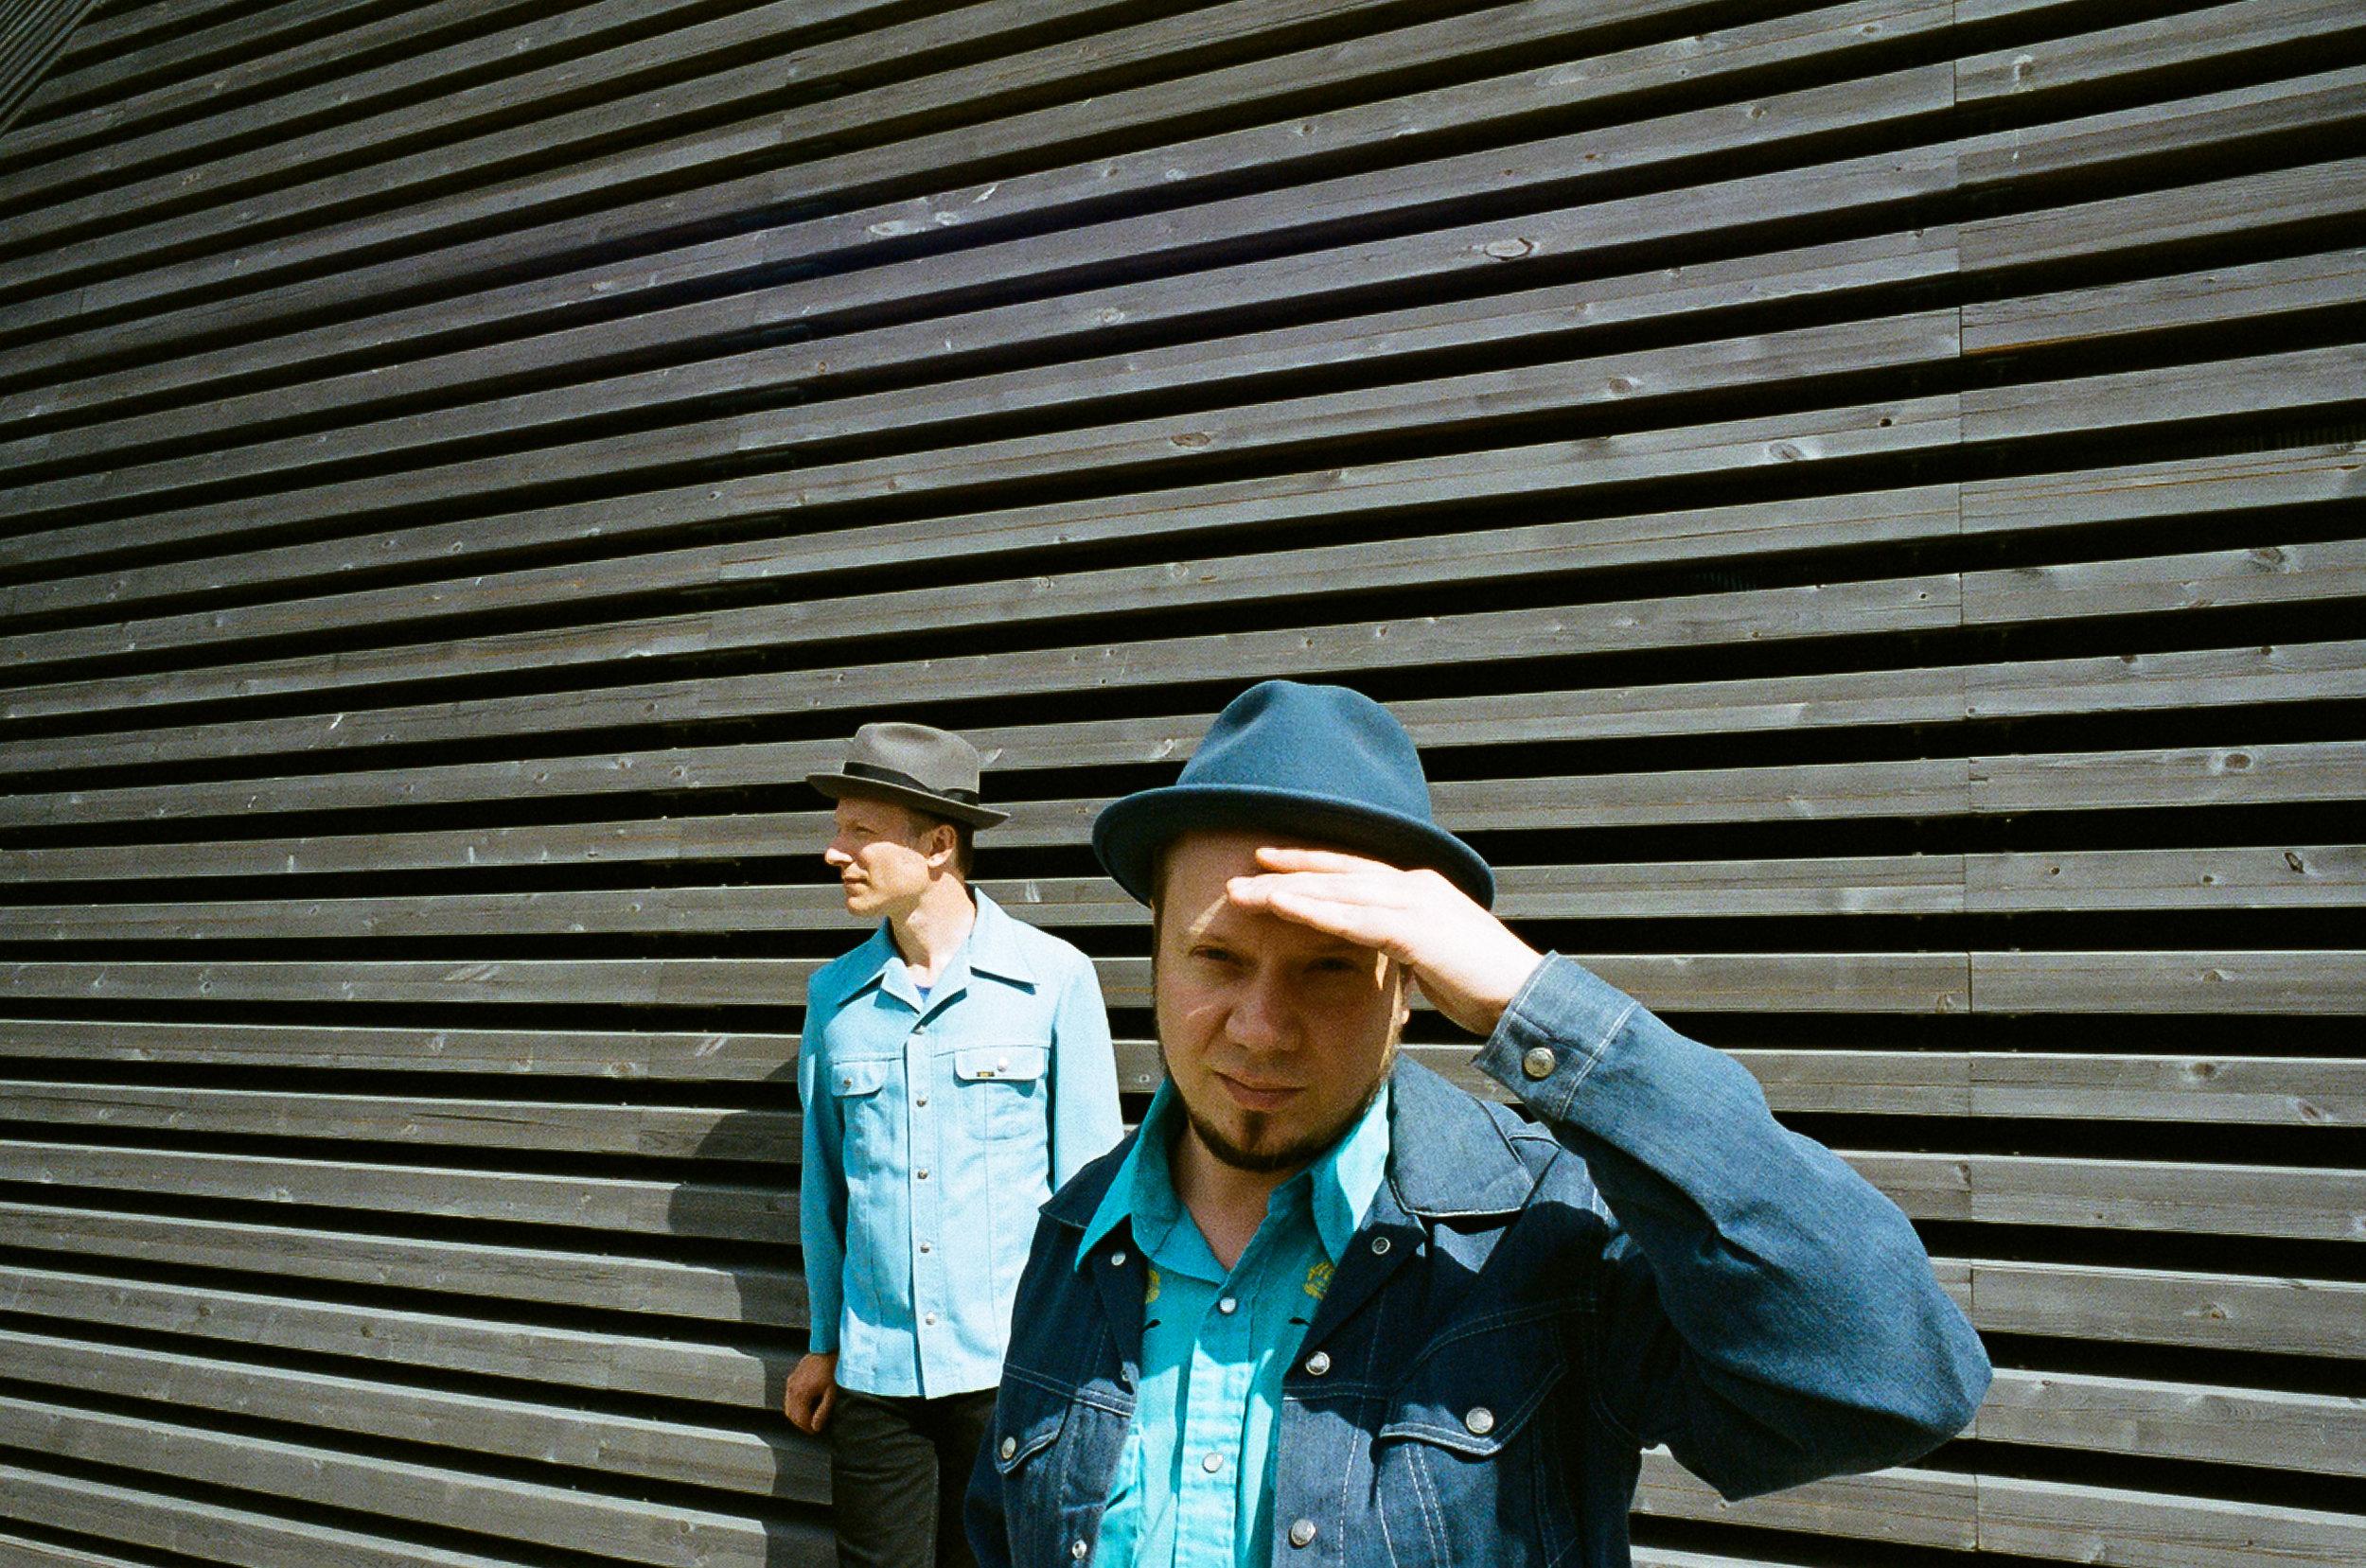 tuomo-markus-0007-photo-tero-ahonen.jpg